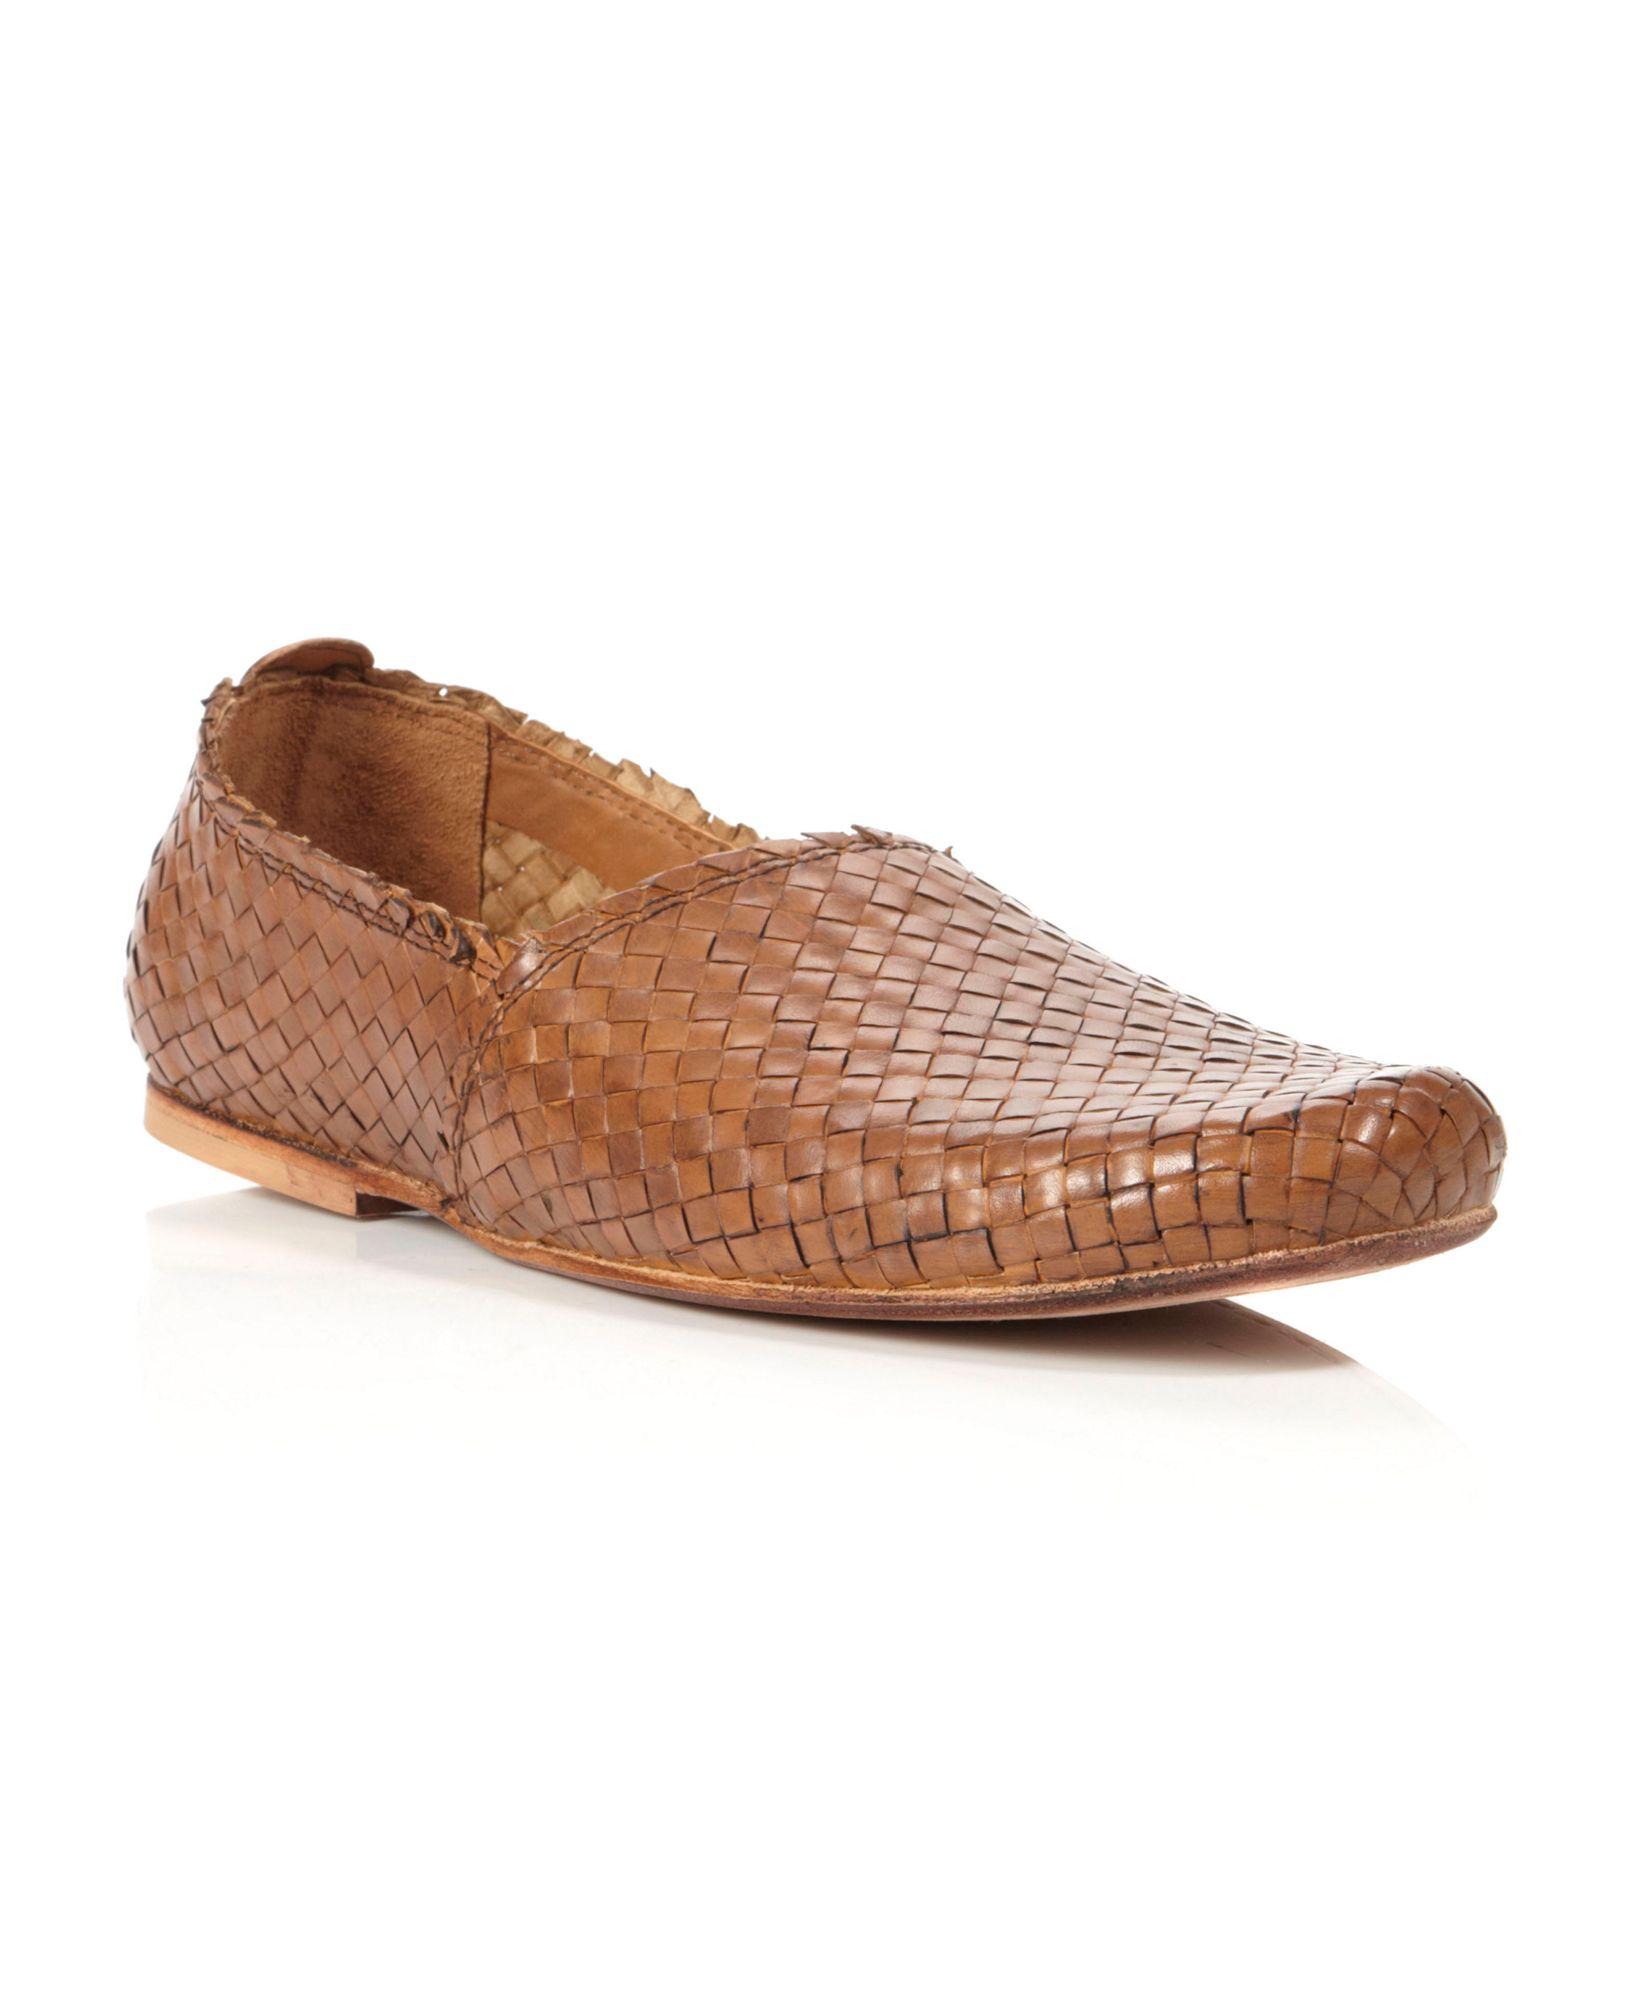 Hudson Jeans Cozumez Woven Slip On Shoes In Brown For Men Lyst